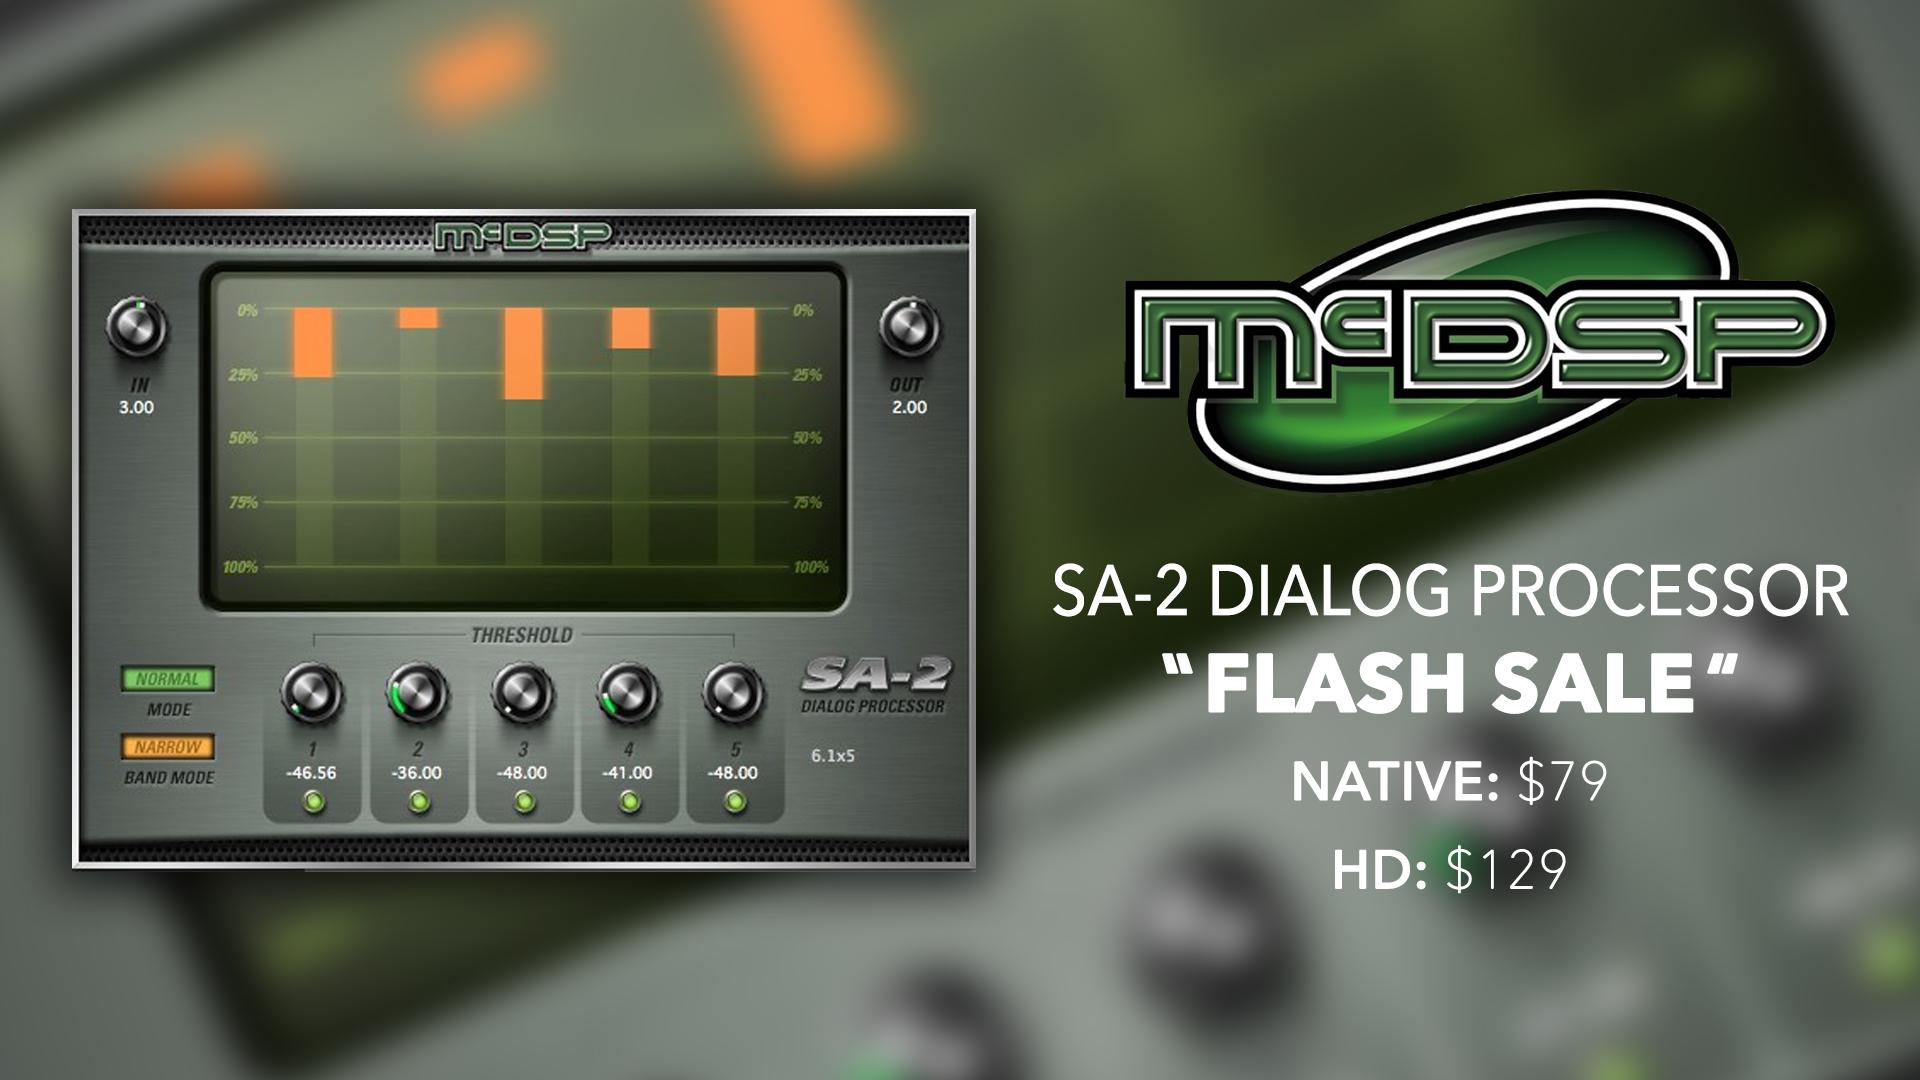 McDSP SA-2 Dialog Processor Sale